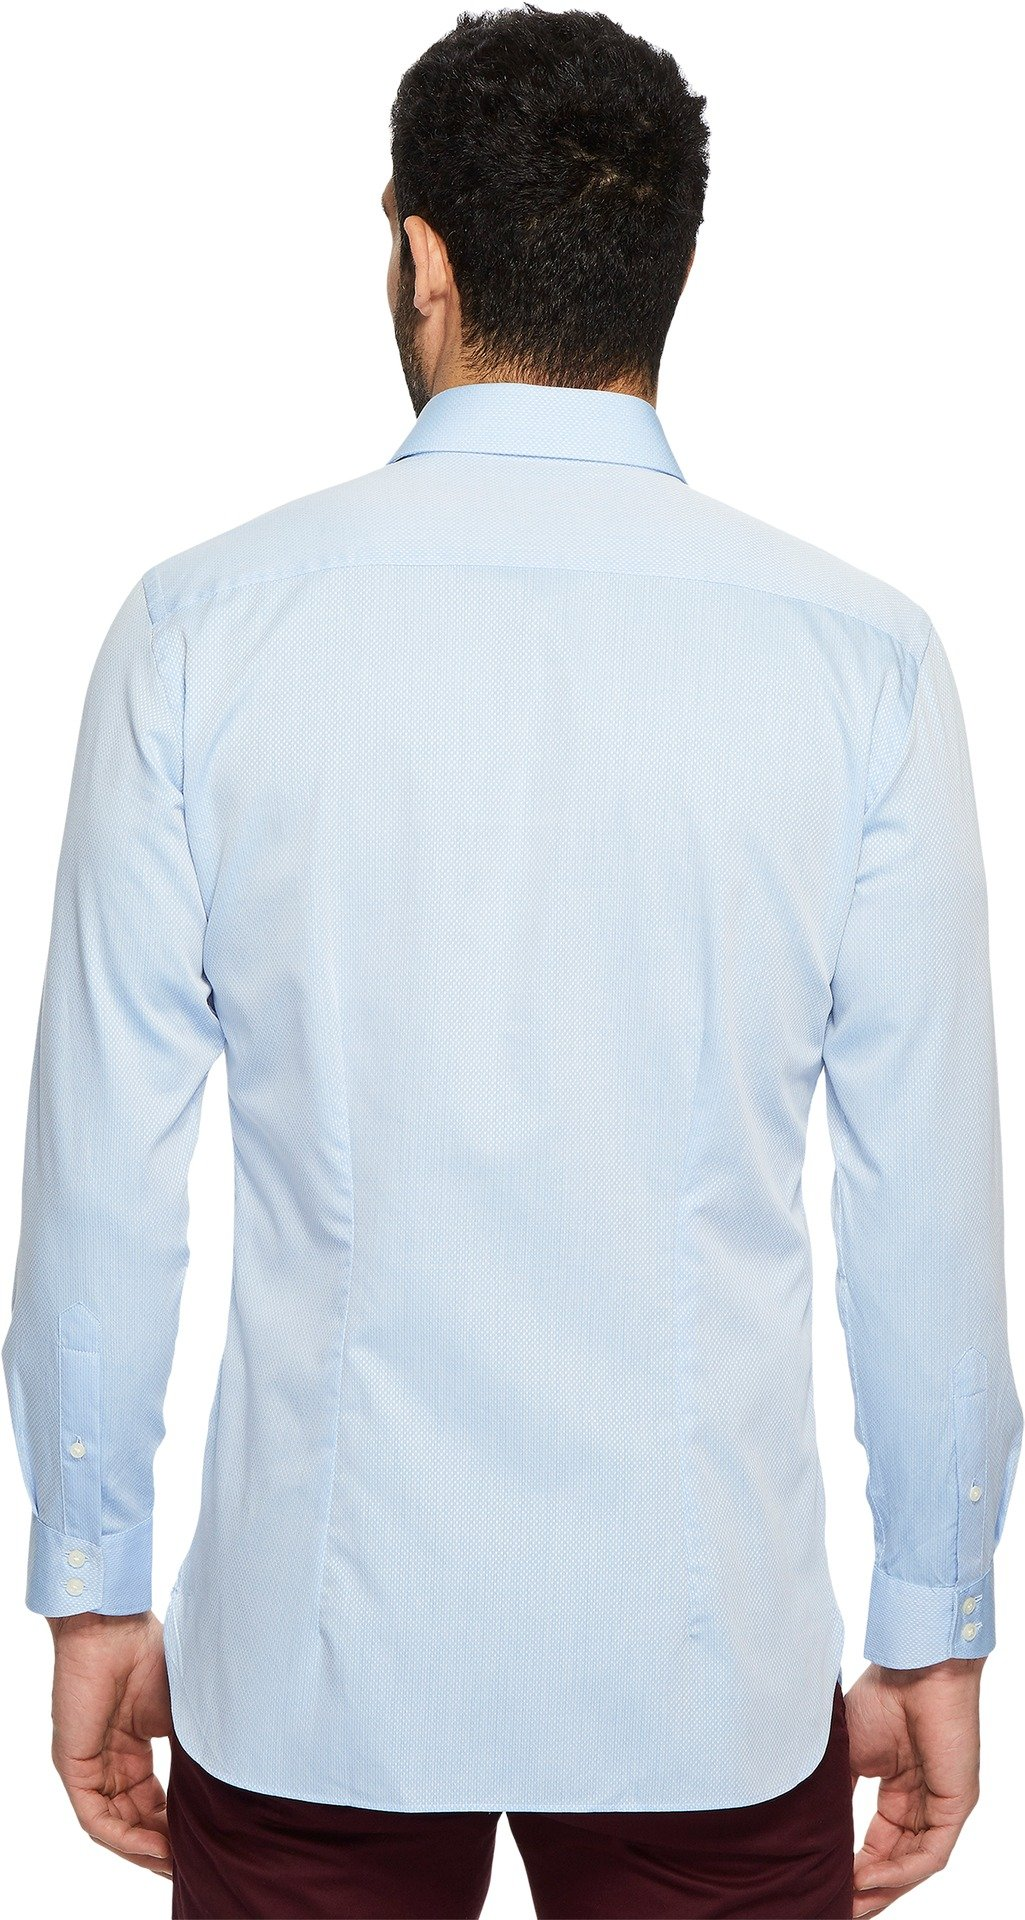 Ted Baker Men's oaker Textured Solid Dress Shirt Blue 17.5-34/35 by Ted Baker (Image #3)